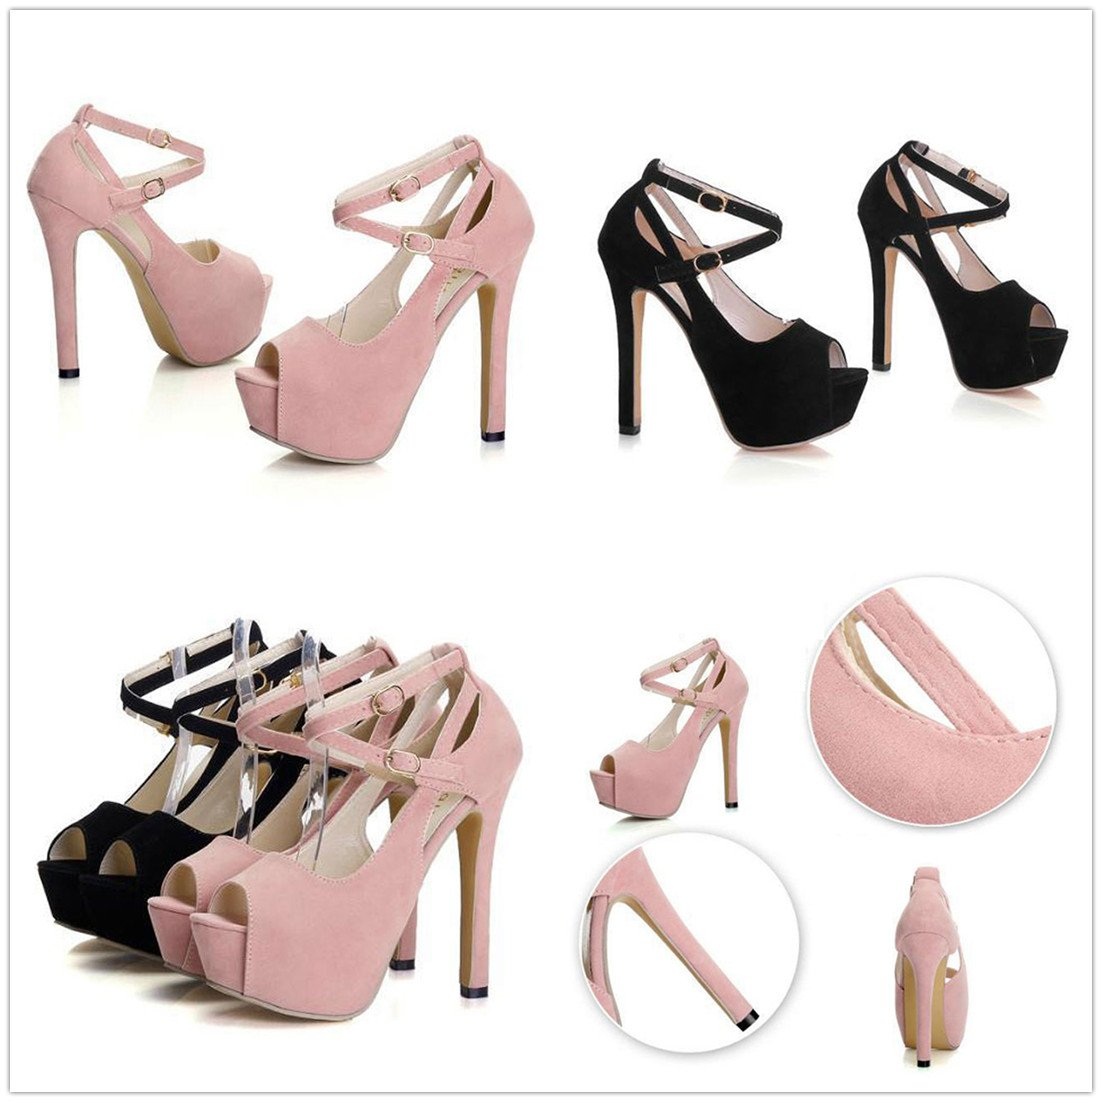 Gaorui Women Girl Peep Toe Ankle Strap Stiletto Shoes High Heel Platform Buckle Sandals